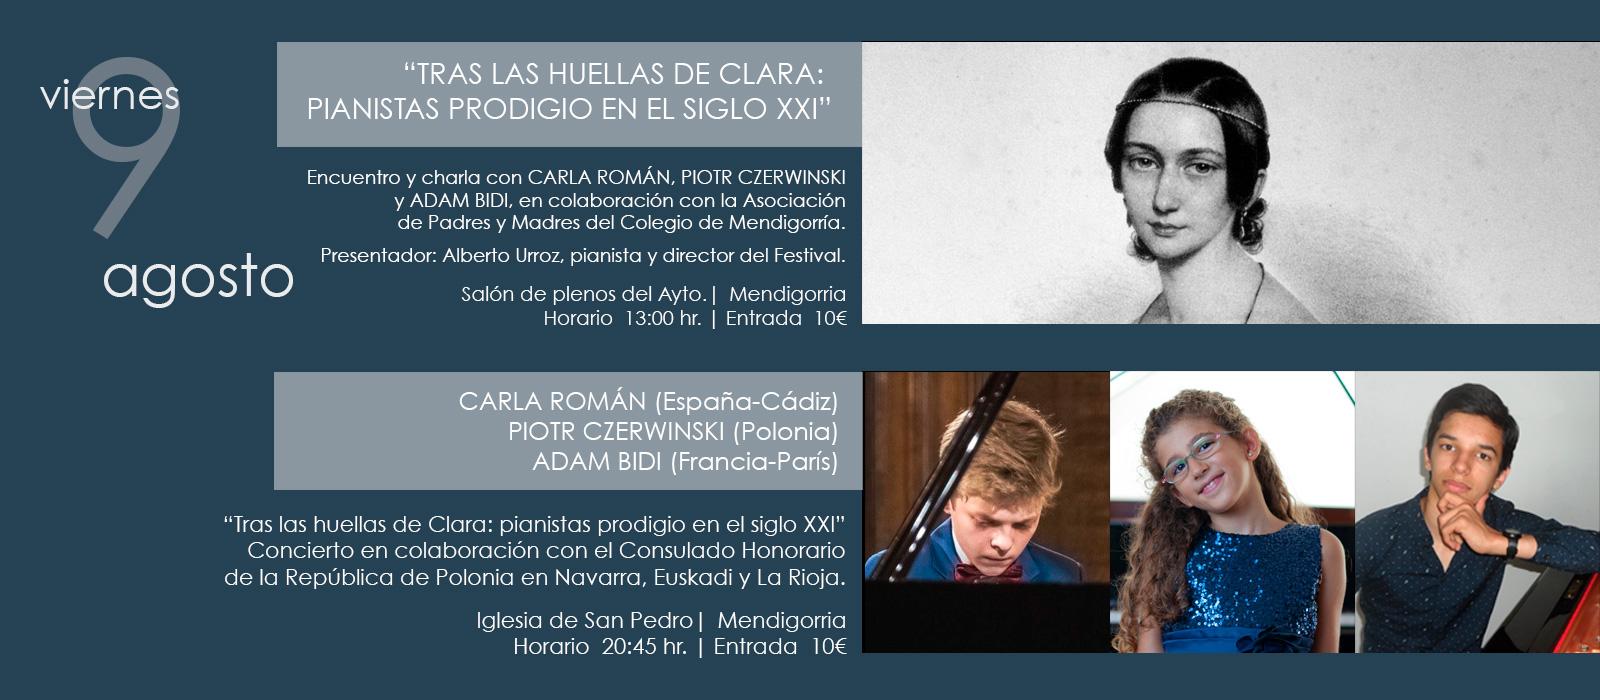 Festival Mendigorria - 9 agosto 2019